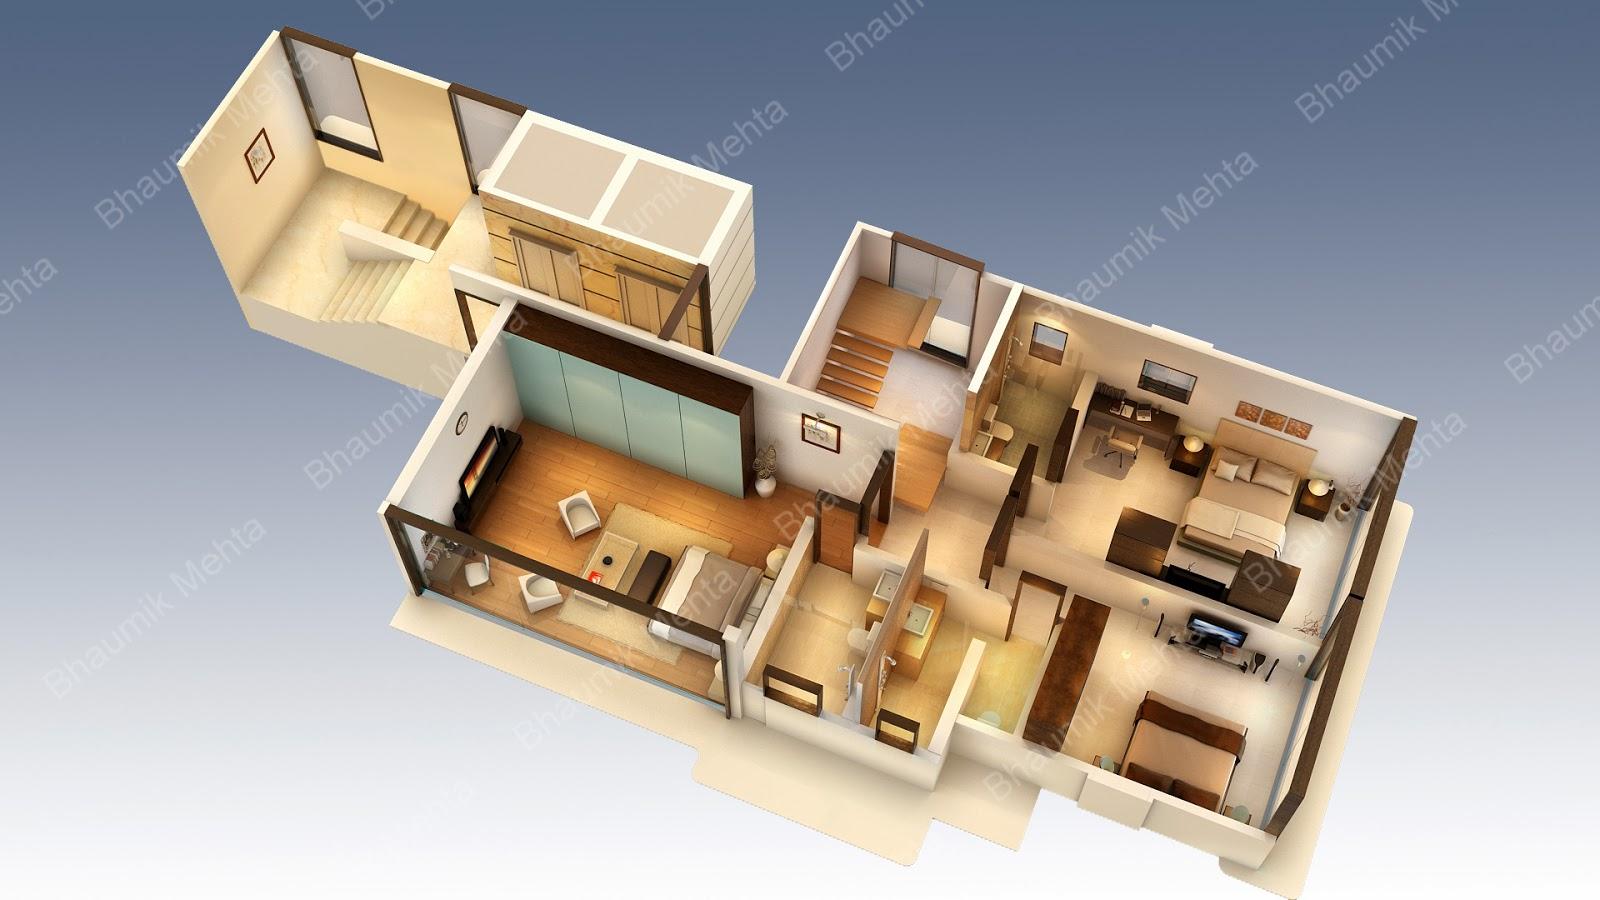 Bhaumik mehta 39 s 3d creations 3d floor plans for 3d planner